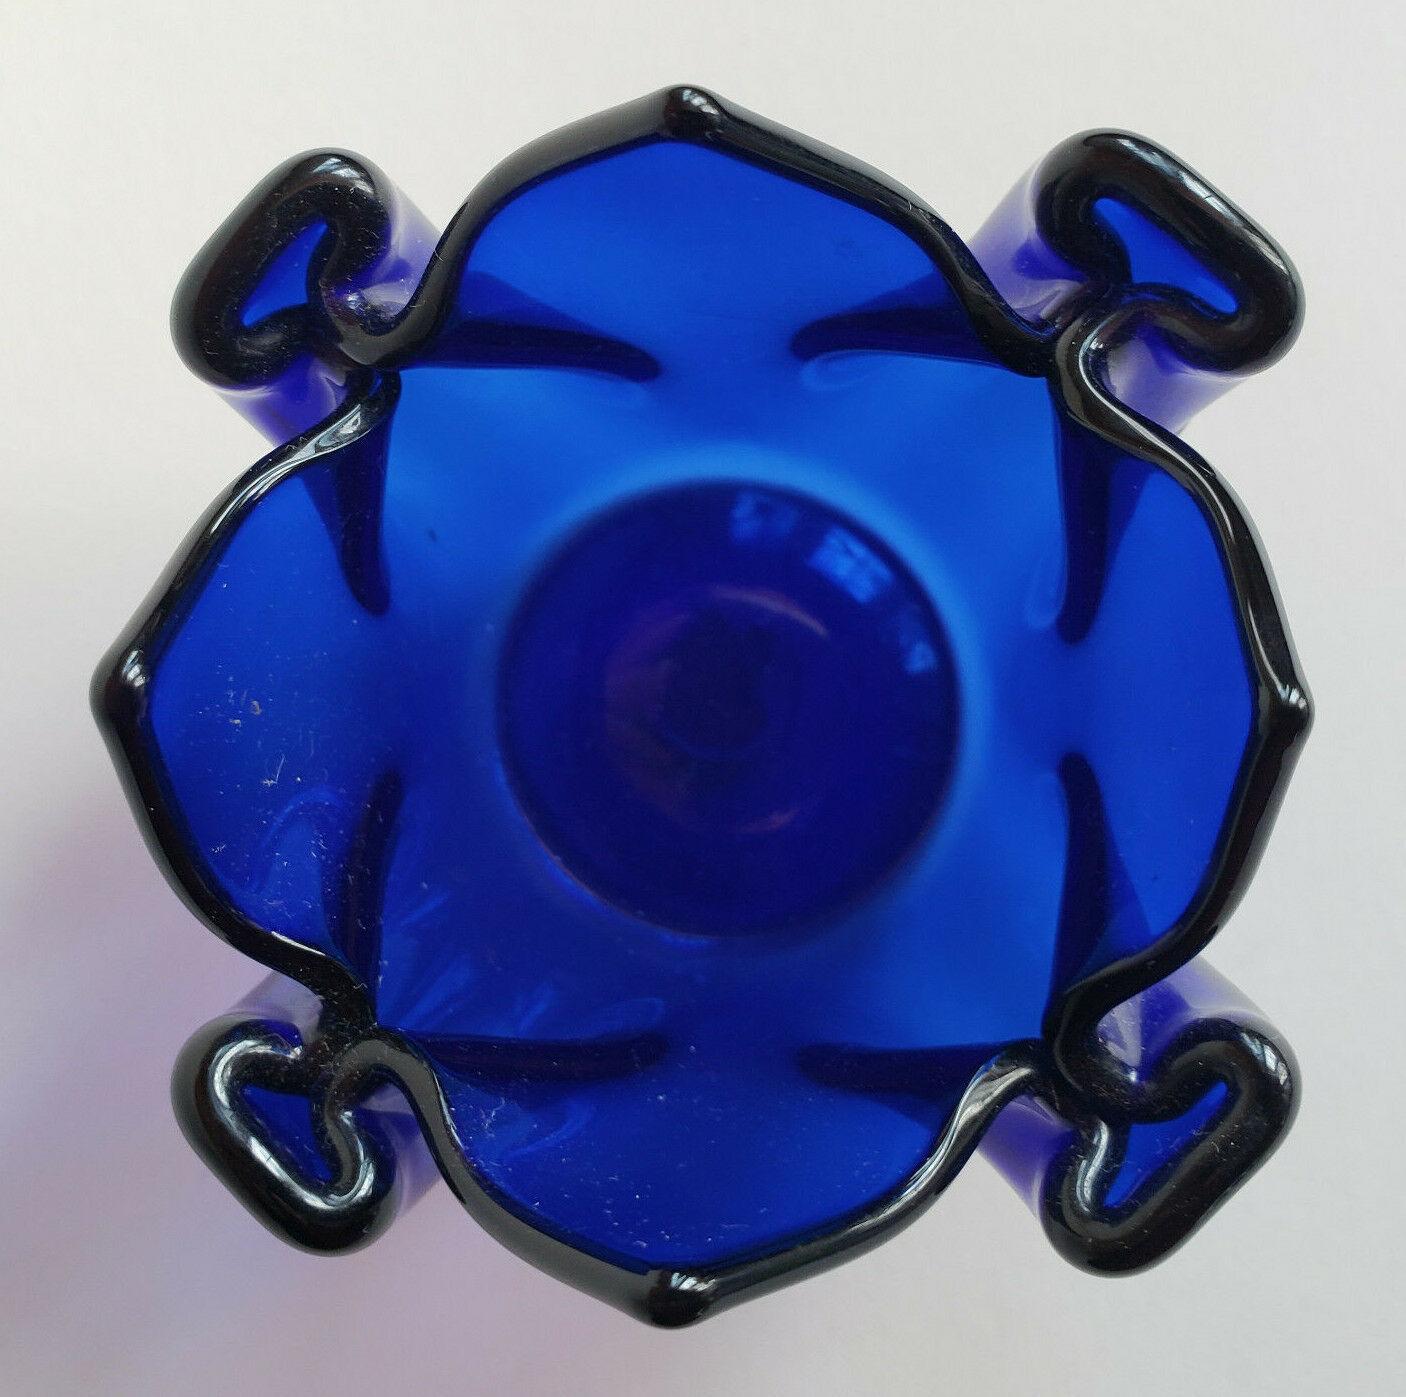 Sapphire Cobalt Indigo Blue Tealight Candle Holder Partylite P0321 Patriotic